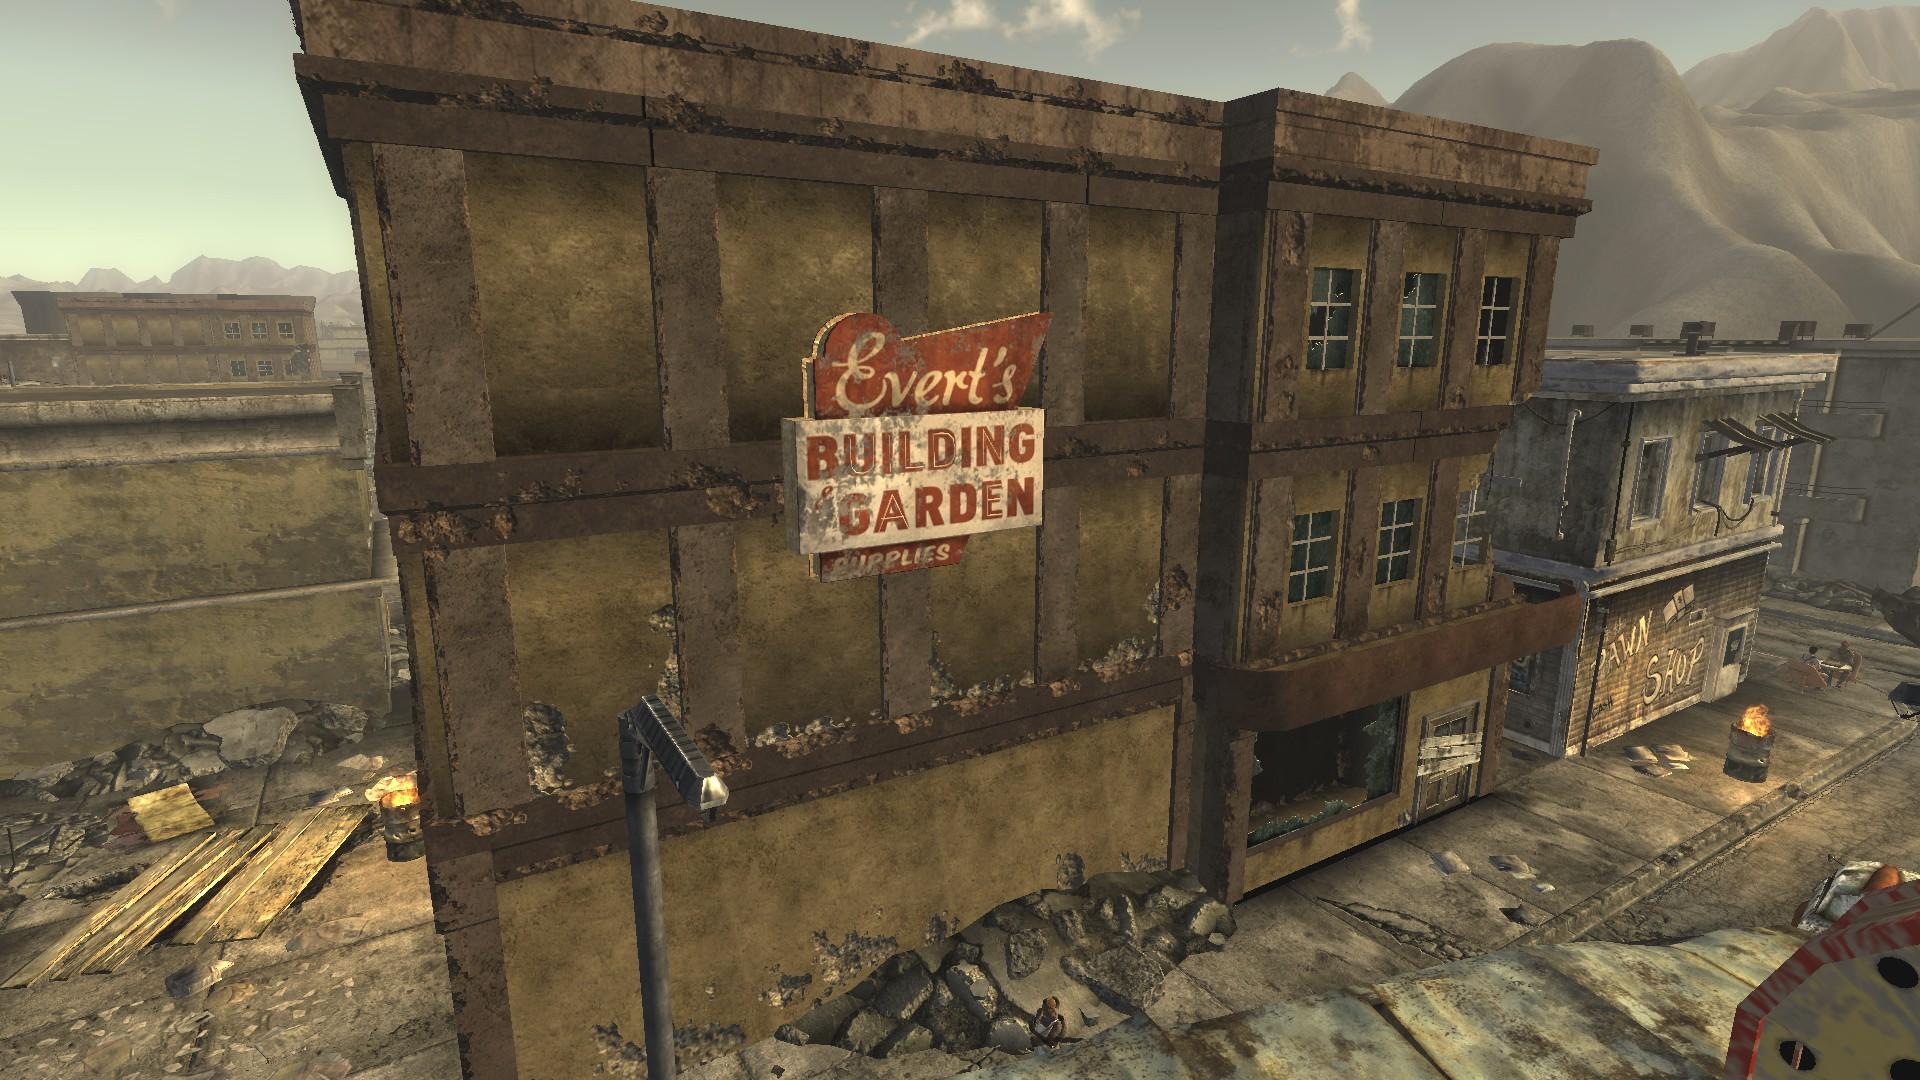 Evert's Building & Garden Suppliesstore